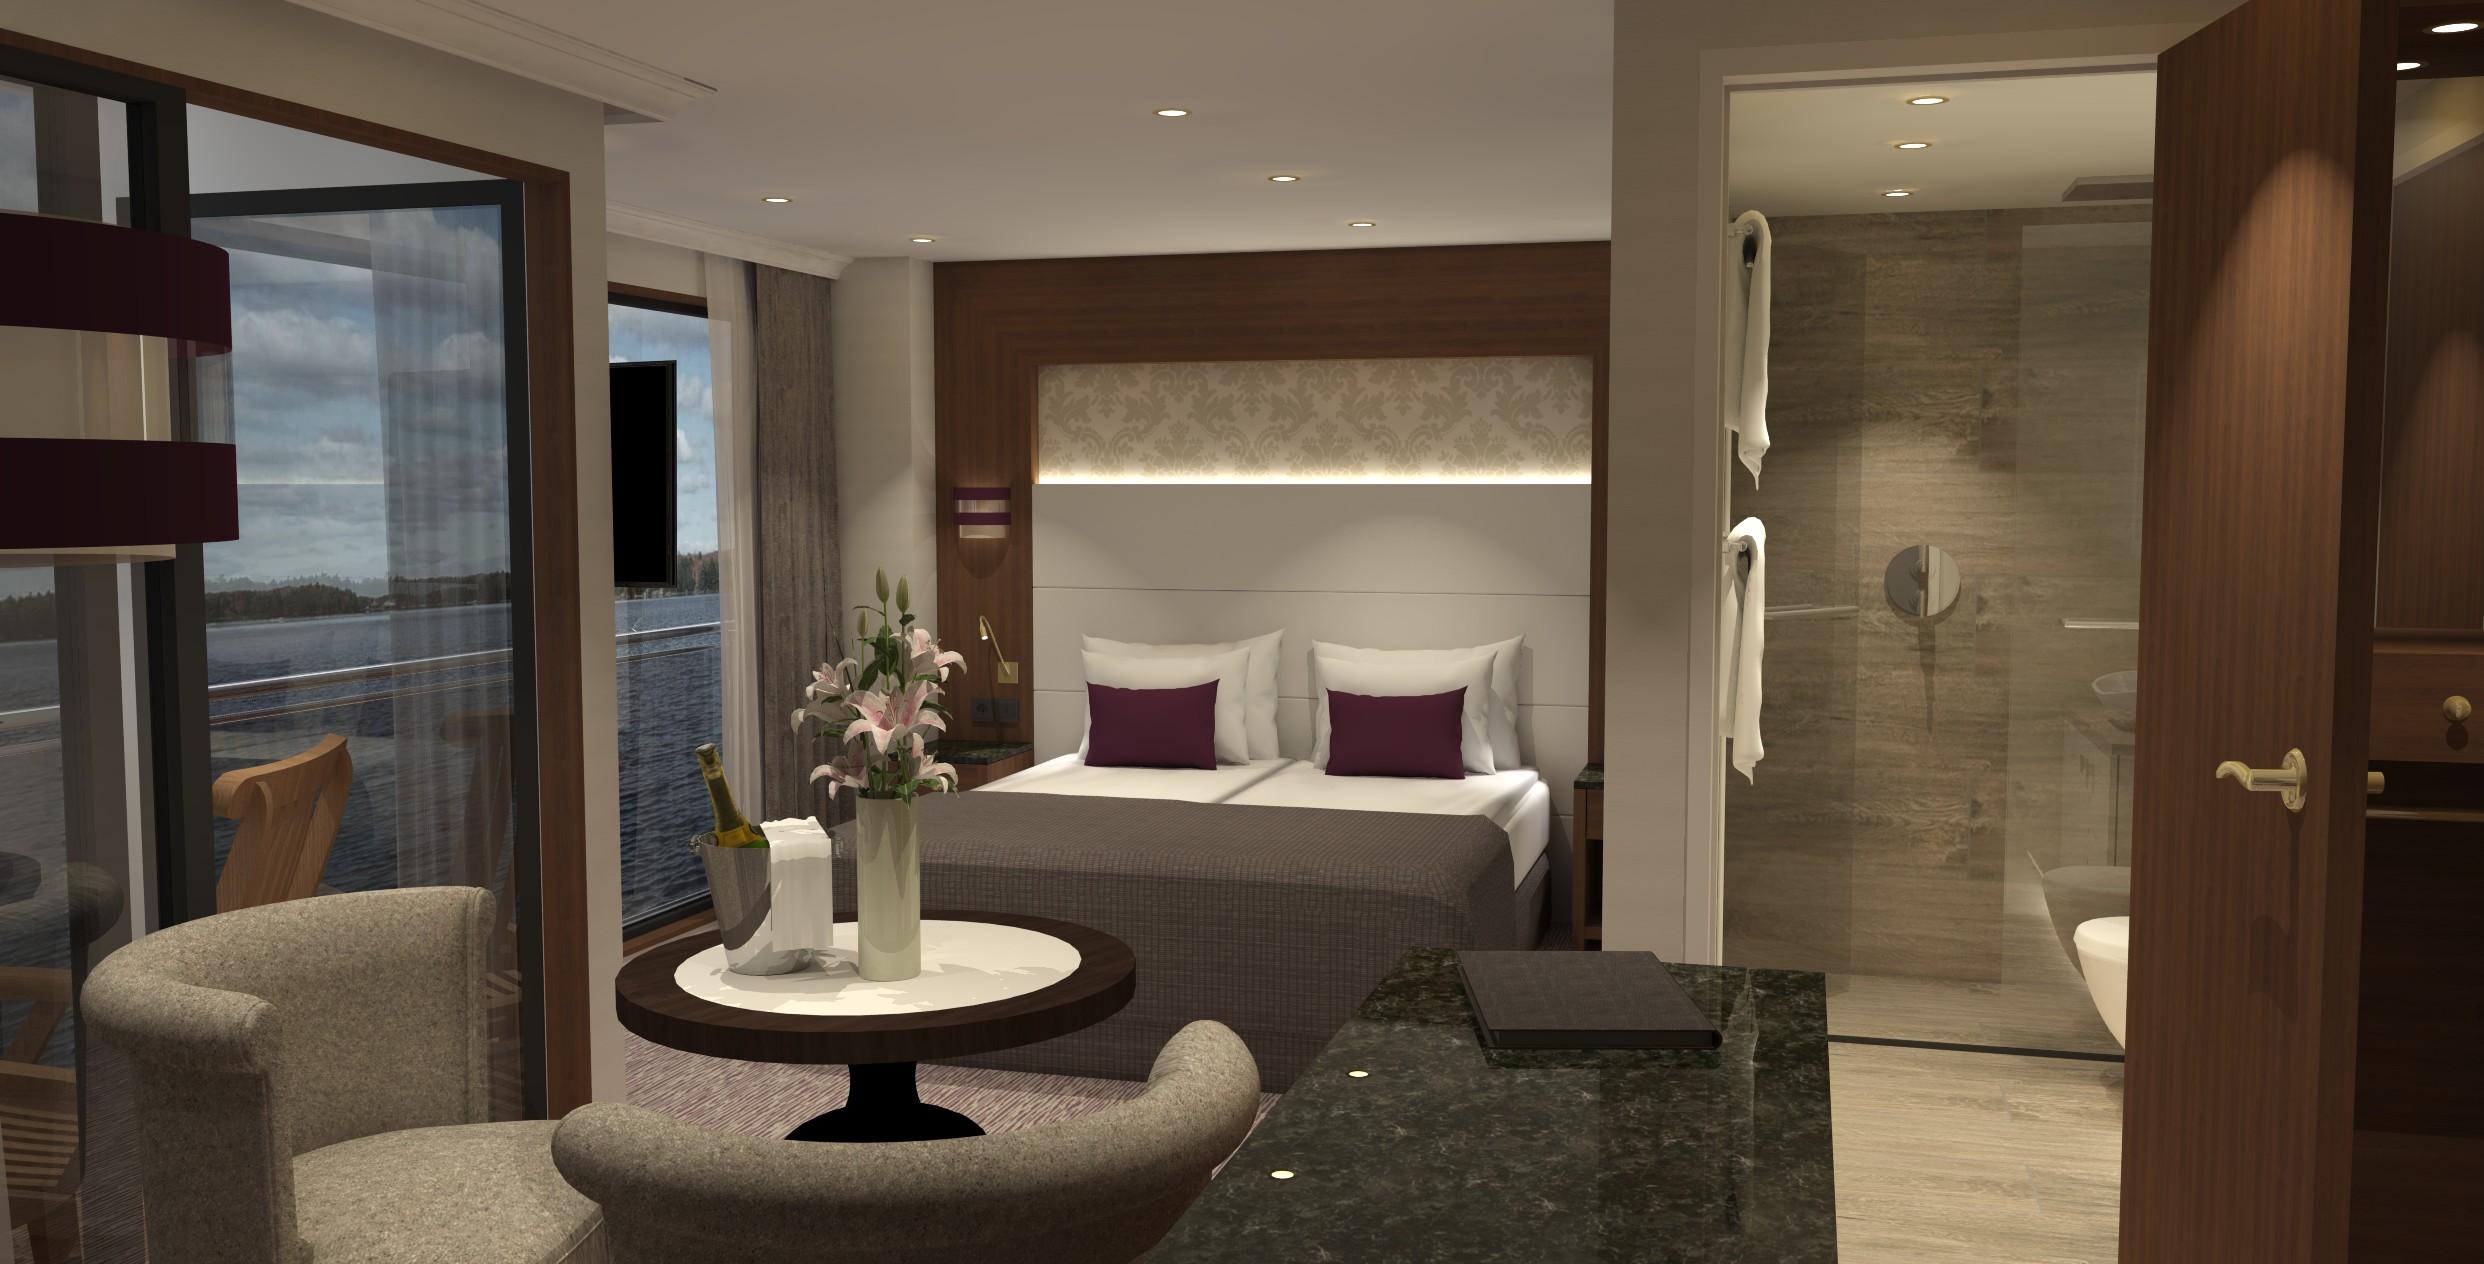 MS oscar wilde deluxe balcony suite.jpg